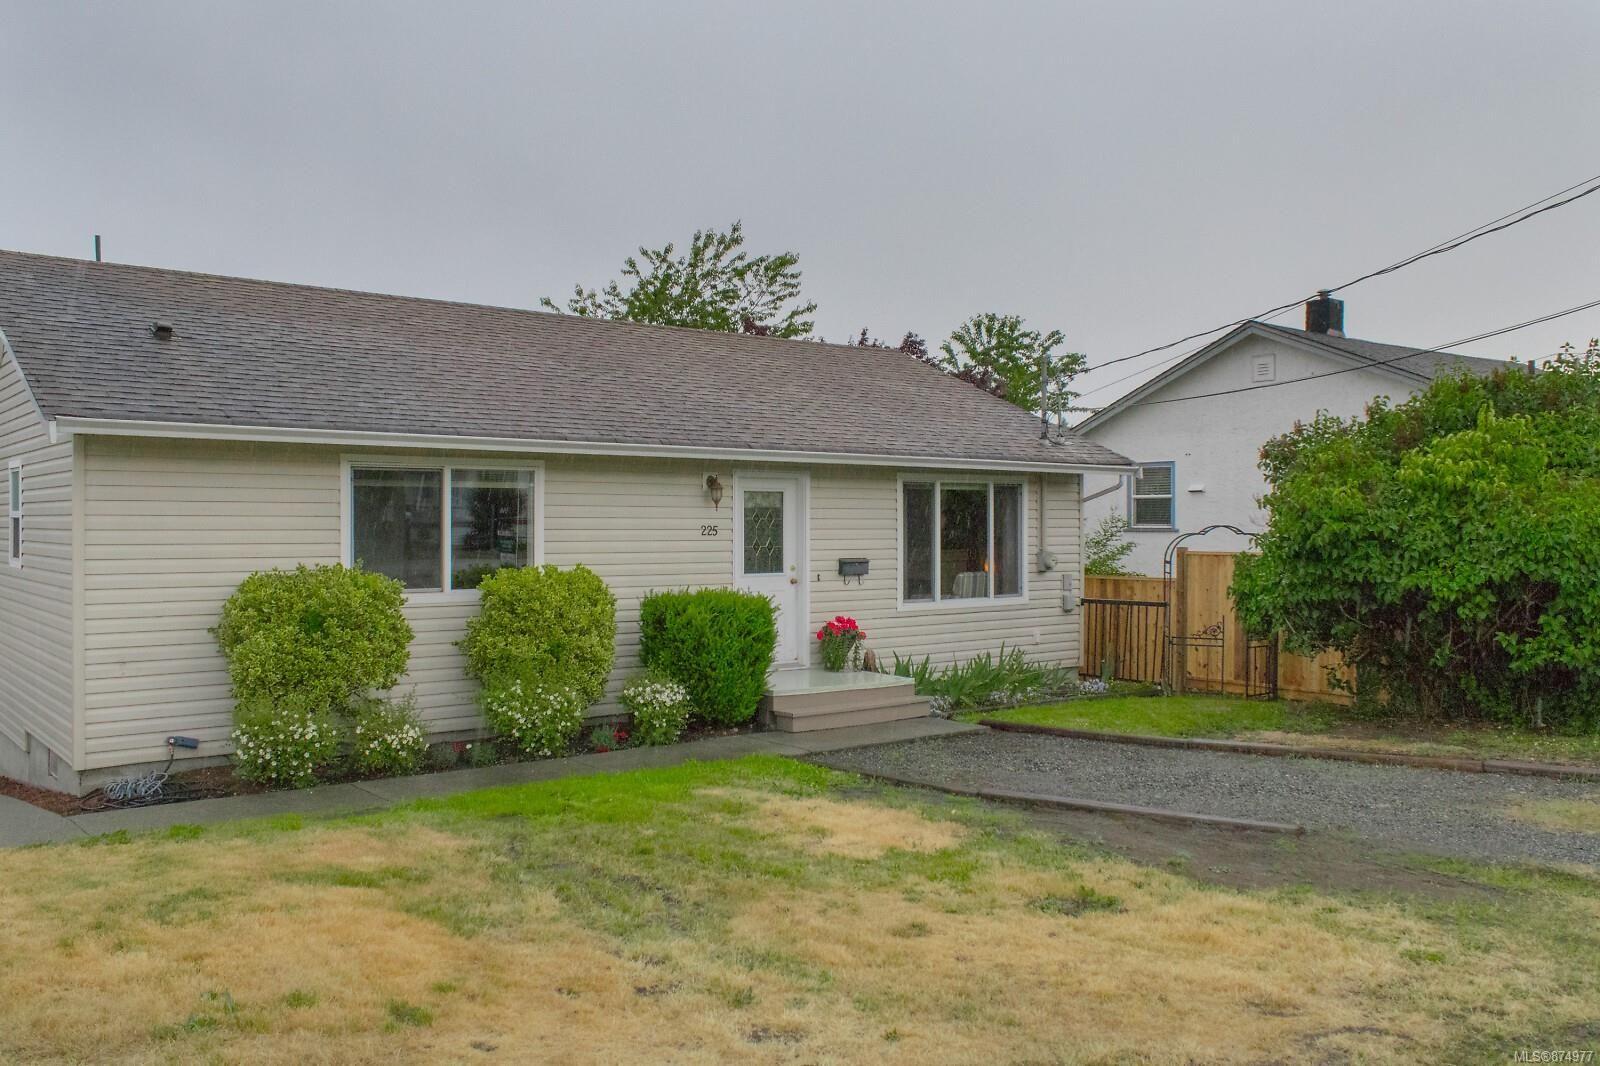 Main Photo: 225 View St in : Na South Nanaimo House for sale (Nanaimo)  : MLS®# 874977